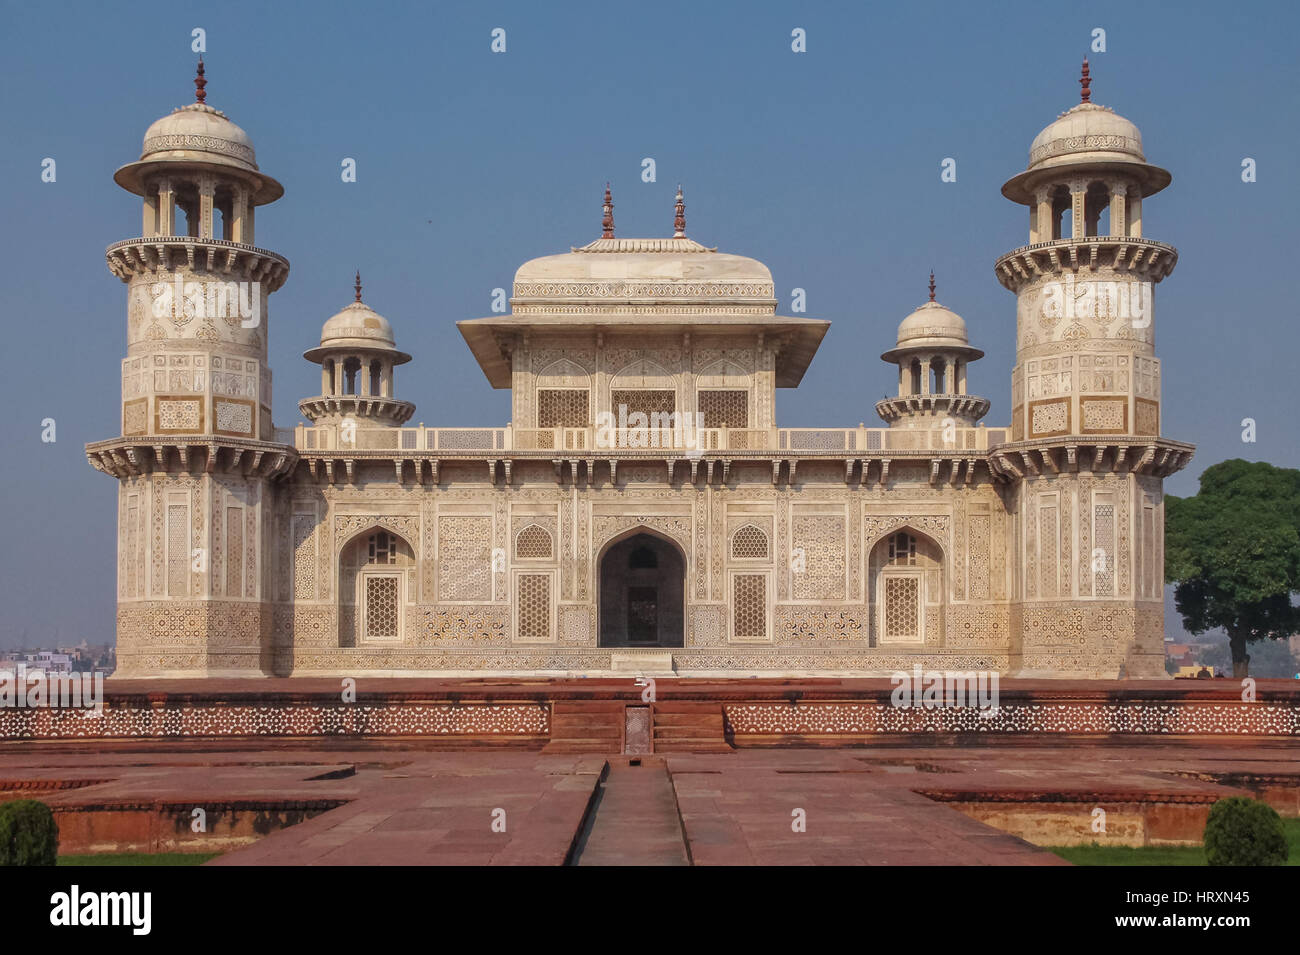 Itmad-Ud-Daulah's Tomb - Agra, India Stock Photo